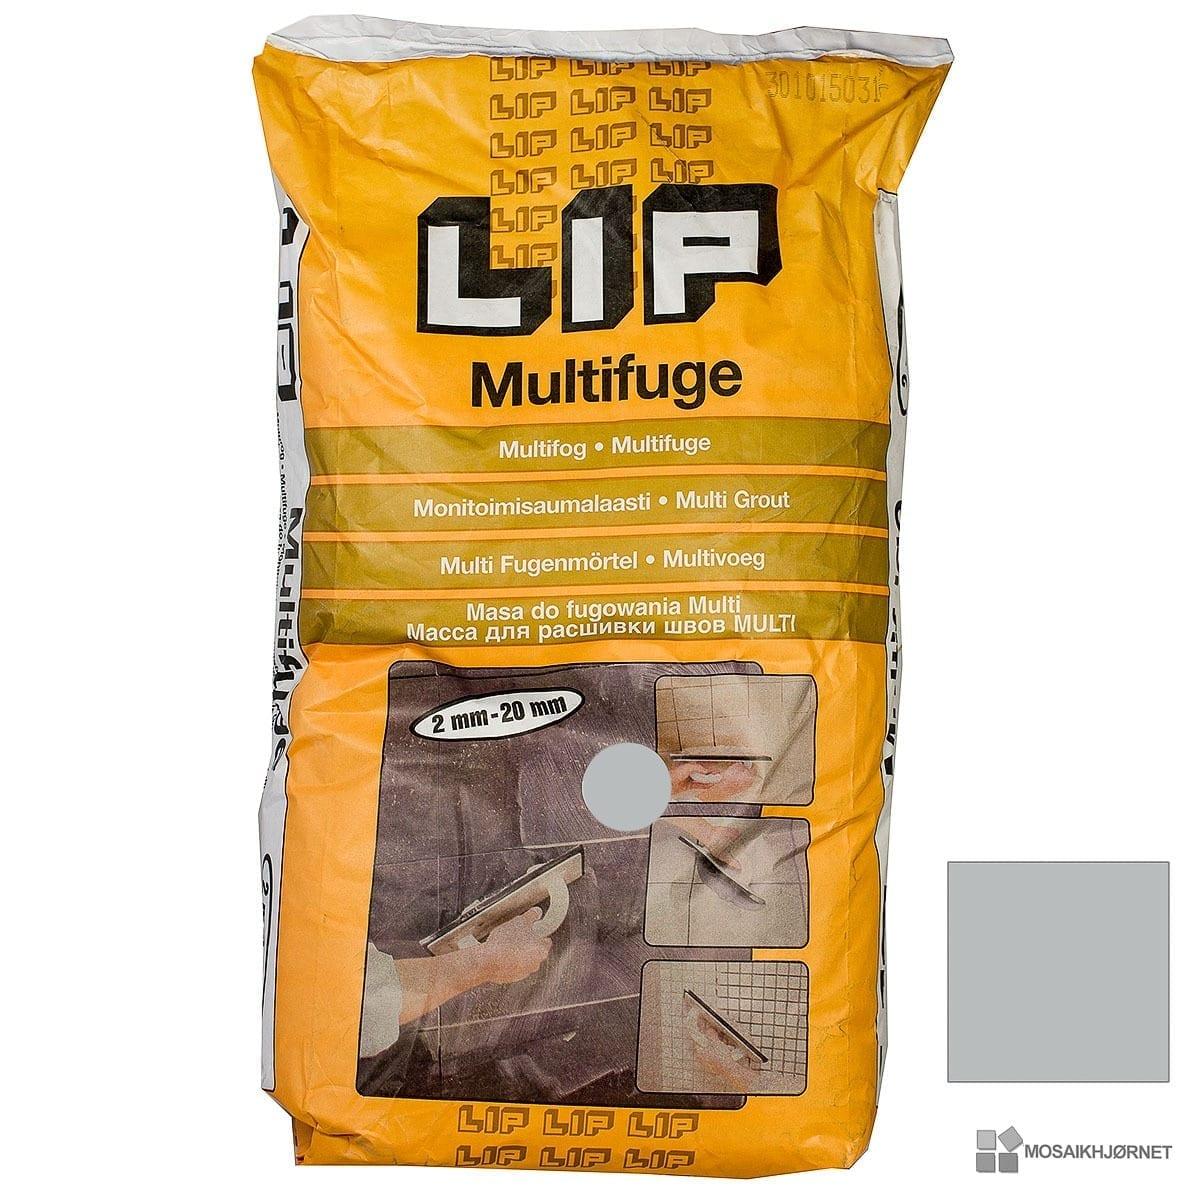 Lip multifuge